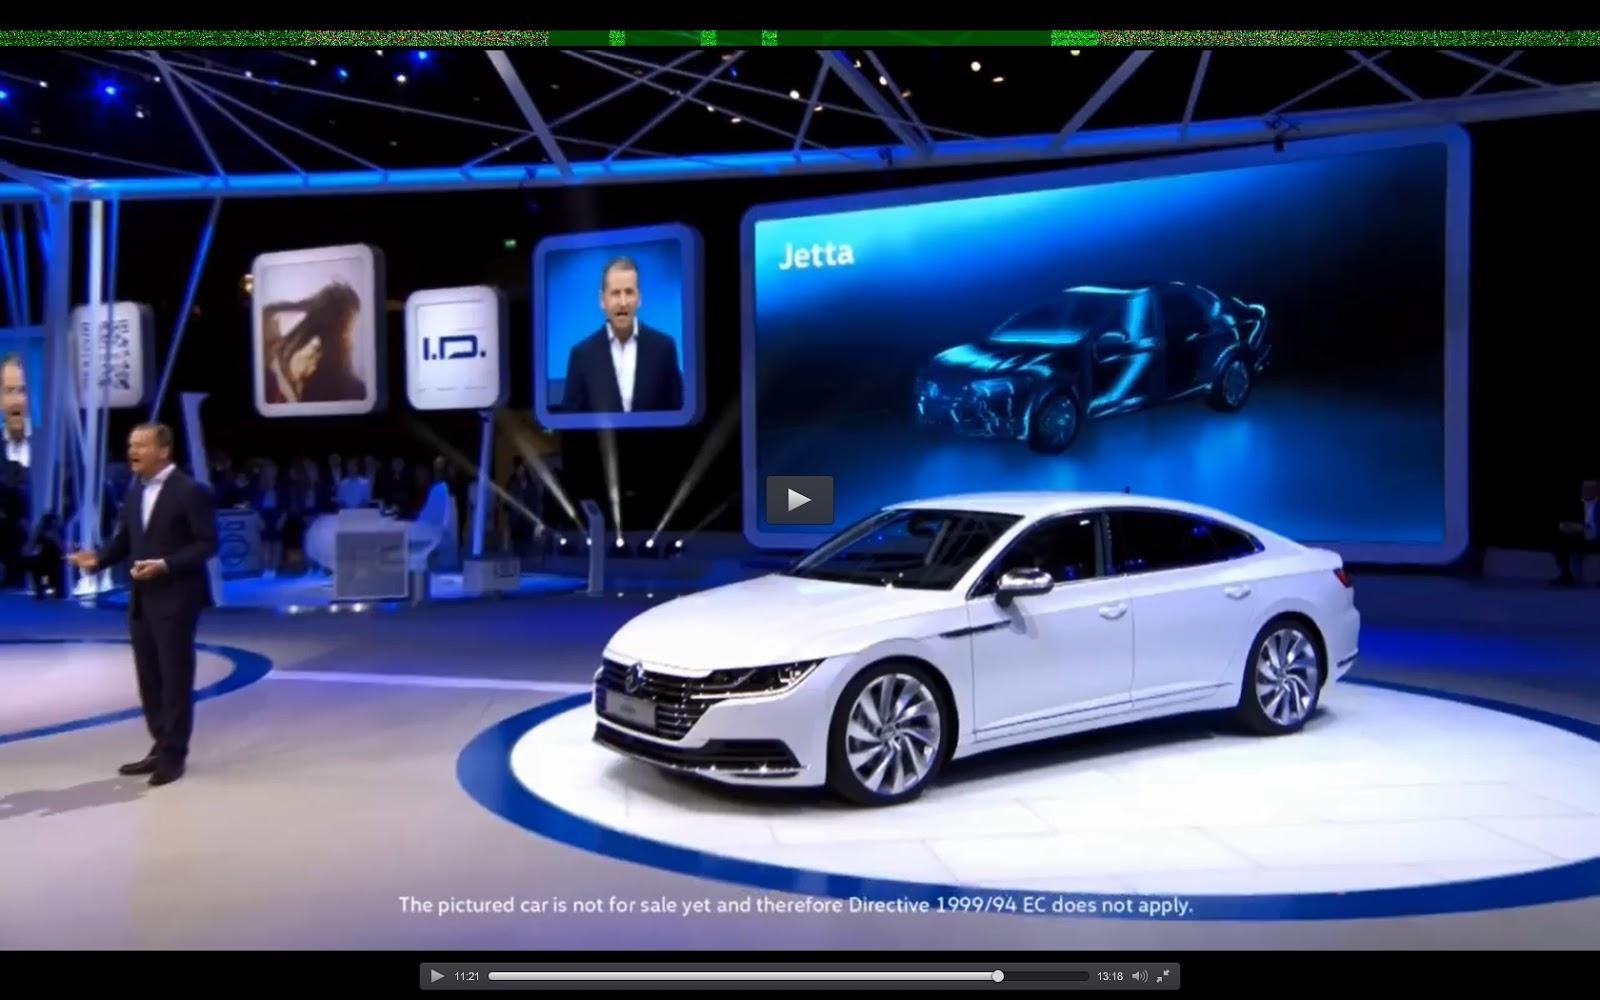 2017 Vw Jetta >> 2018 Volkswagen Jetta revealed!!! (silhouette anyway at Geneva)